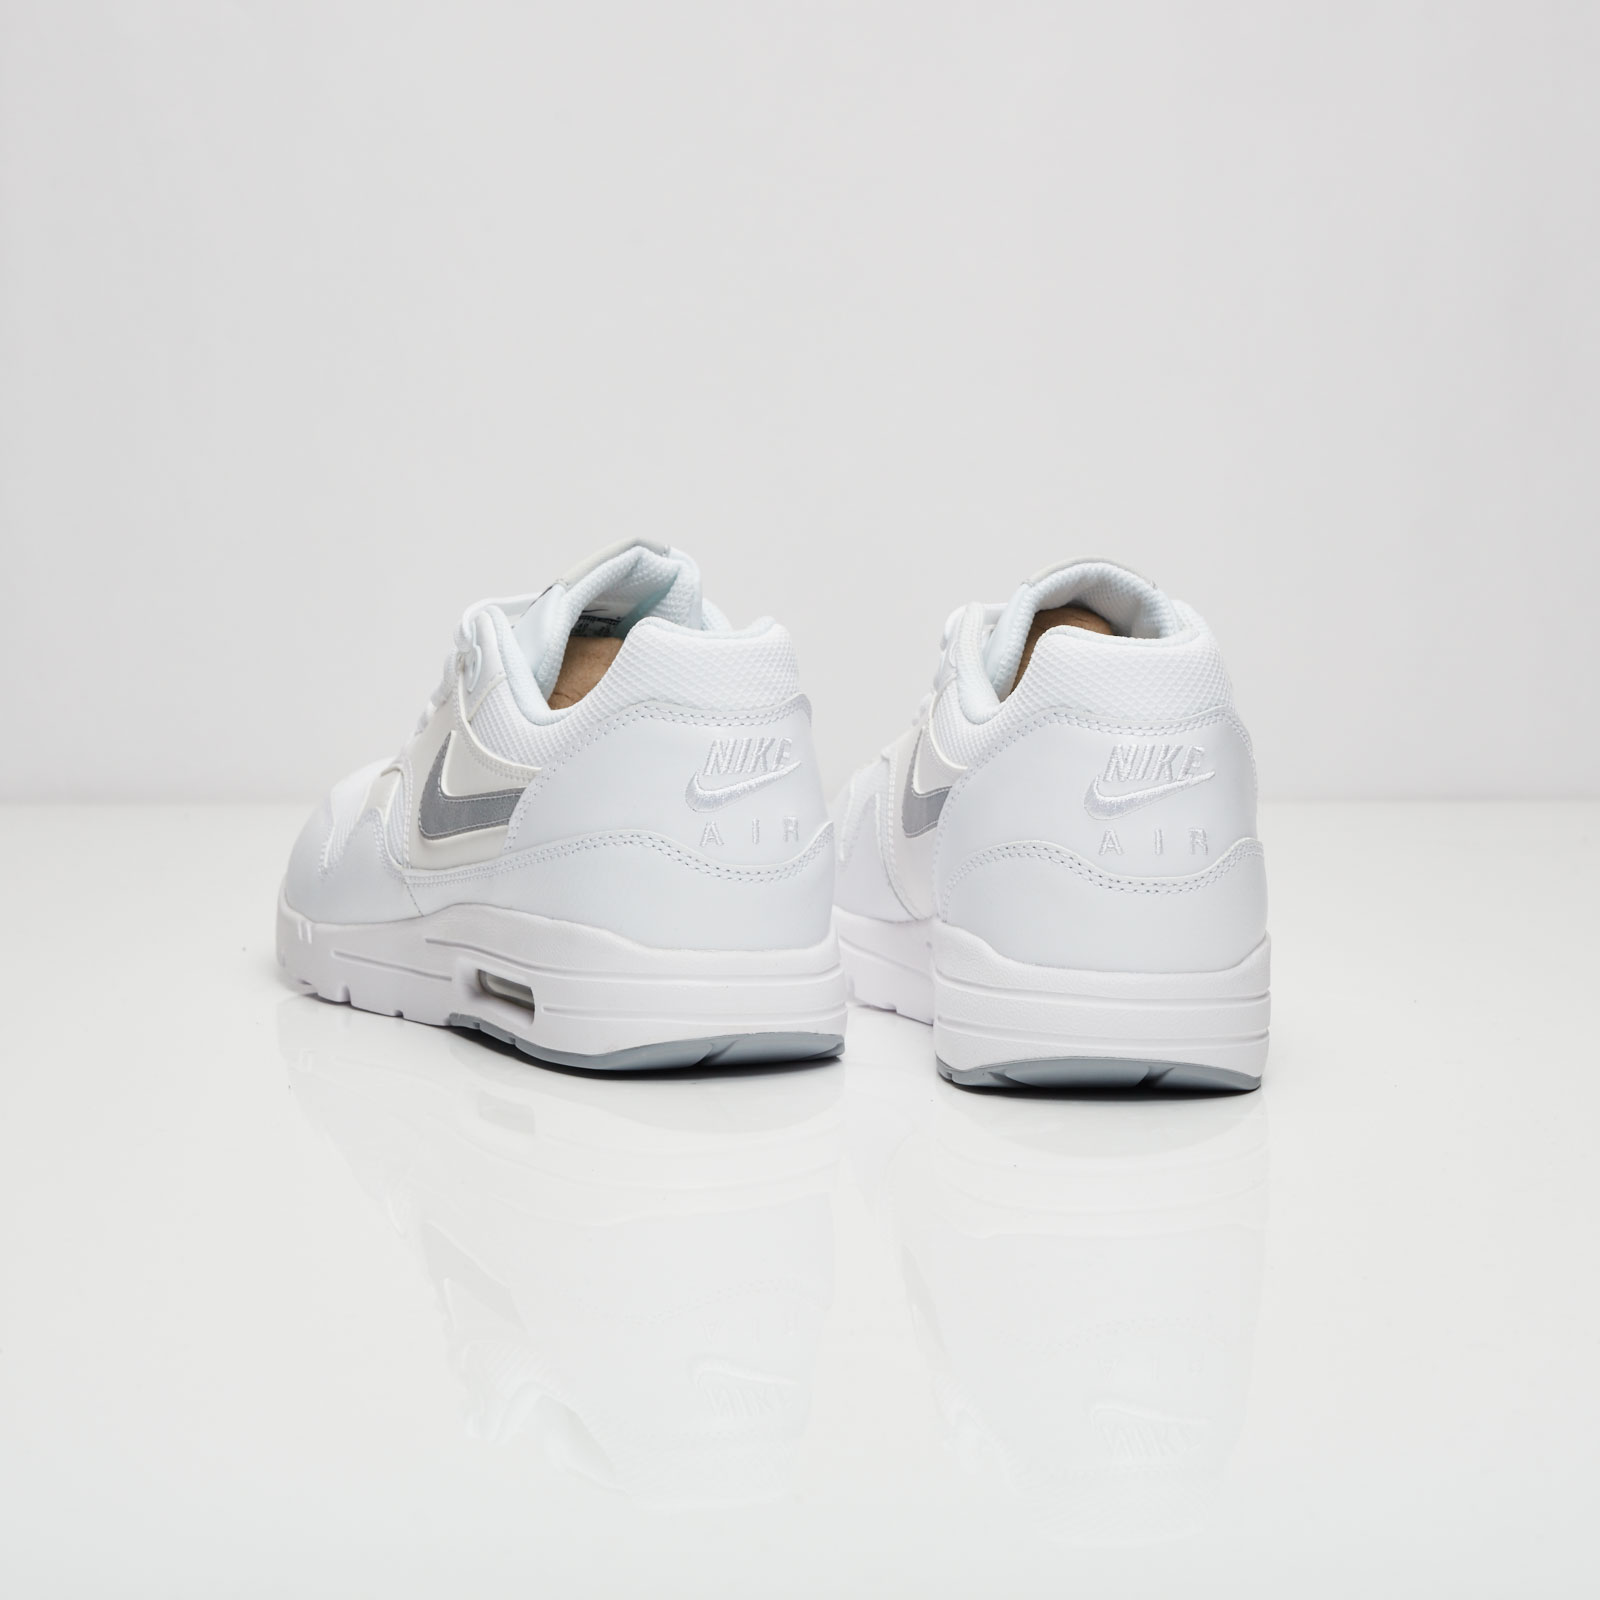 1e5ad3aac8 Nike Air Max 1 Ultra Essential - 704993-102 - Sneakersnstuff | sneakers &  streetwear online since 1999